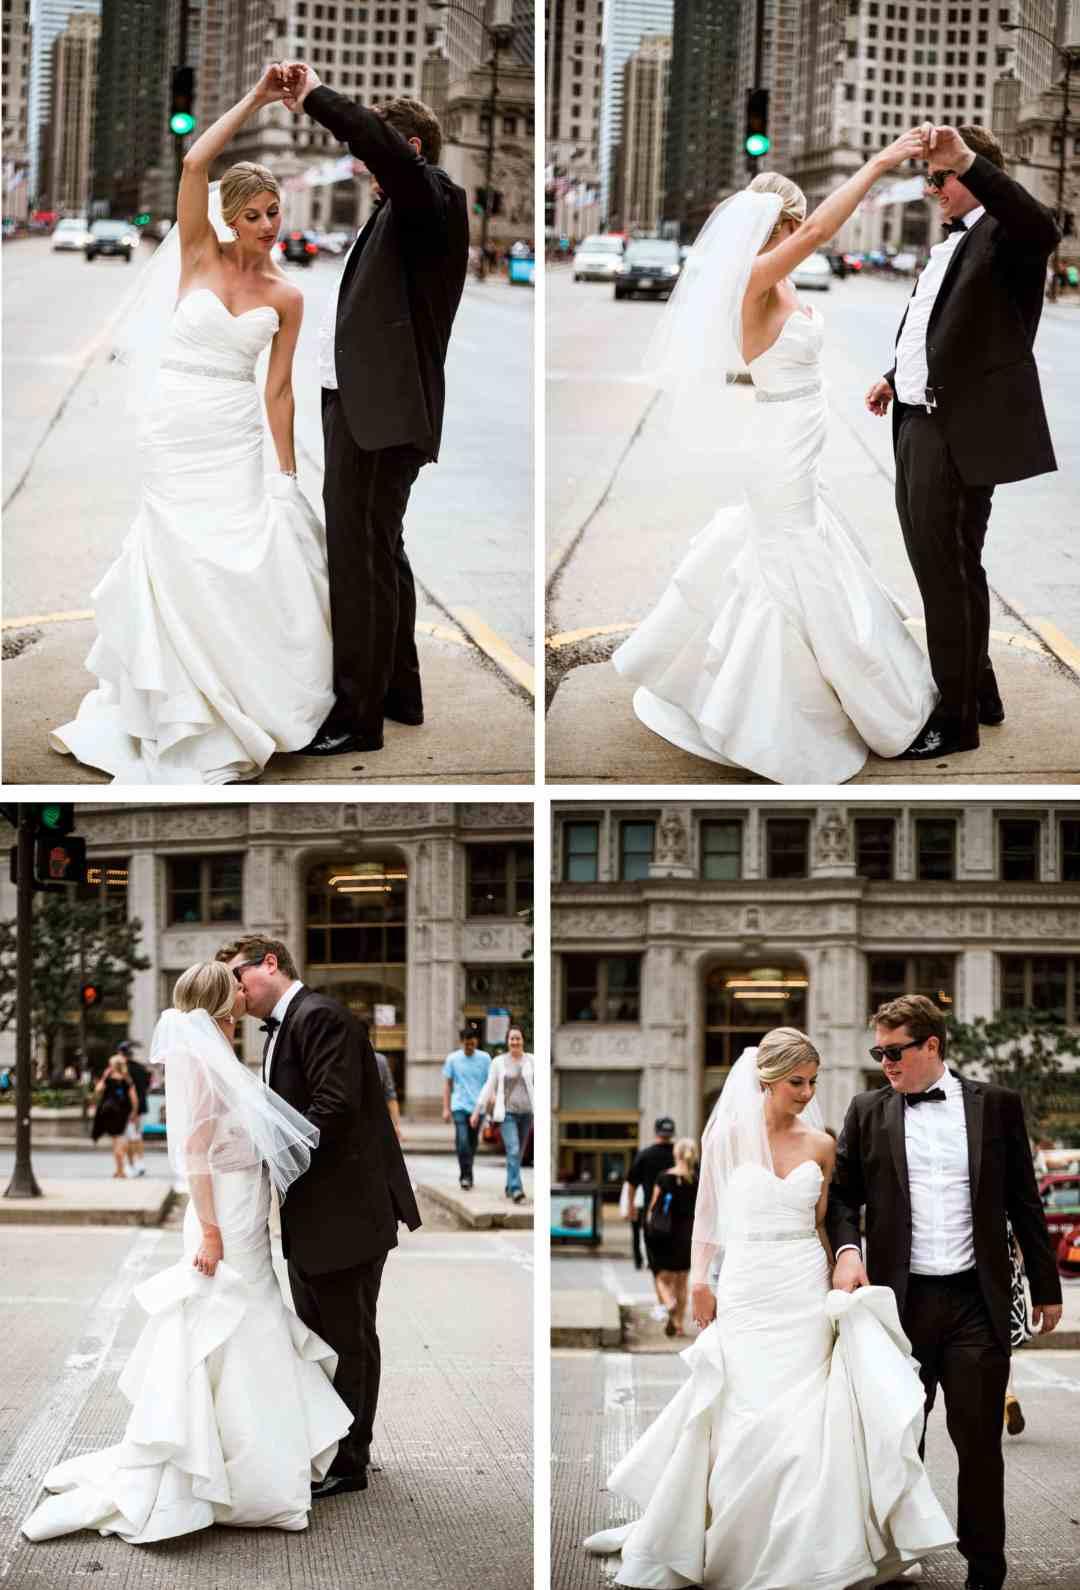 Downtown Chicago wedding portraits - West Sussex Wedding Photographer